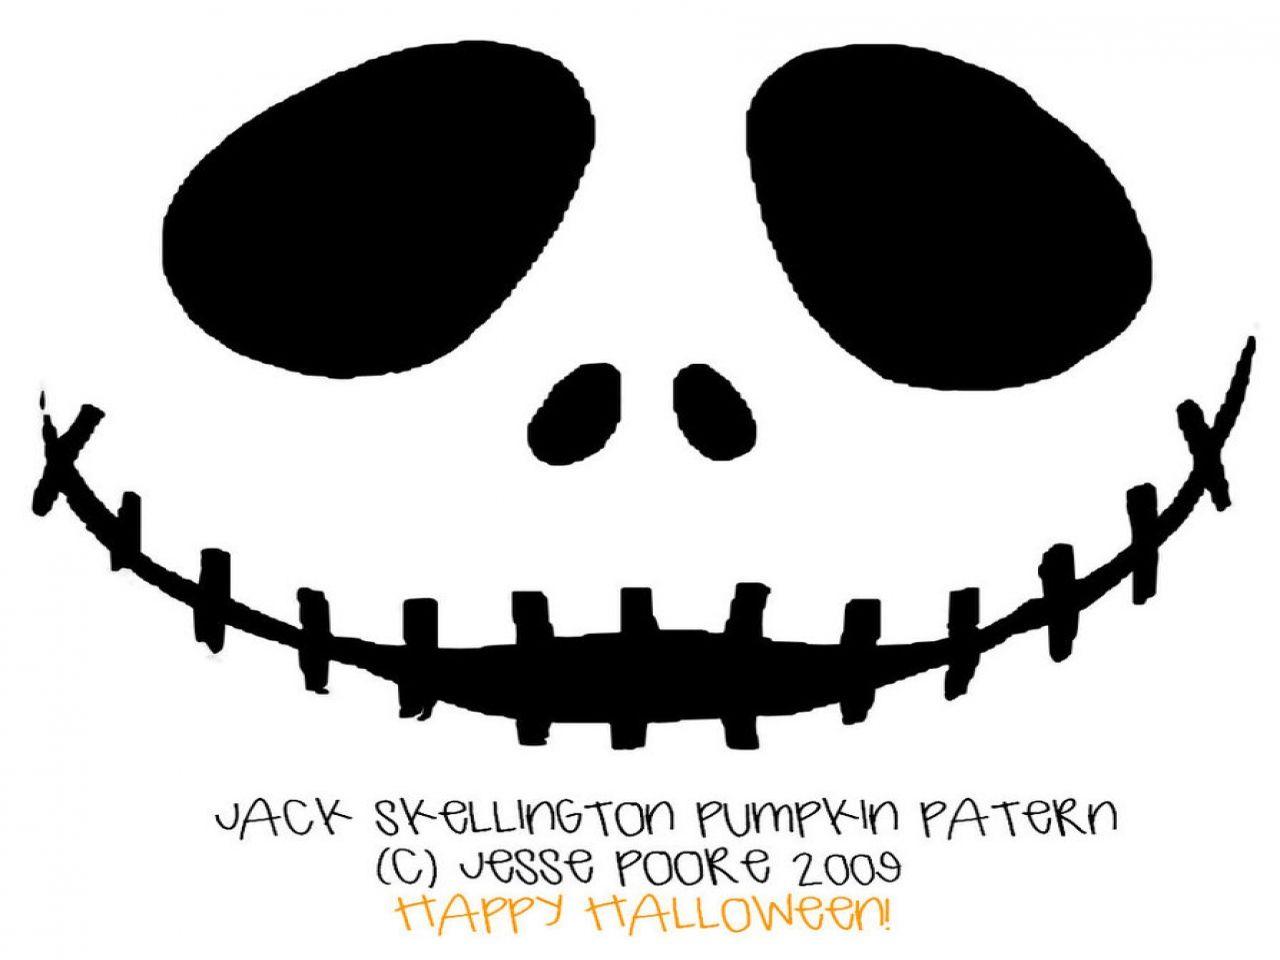 Free Printable Jack Skellington Pumpkin Carving Stencil